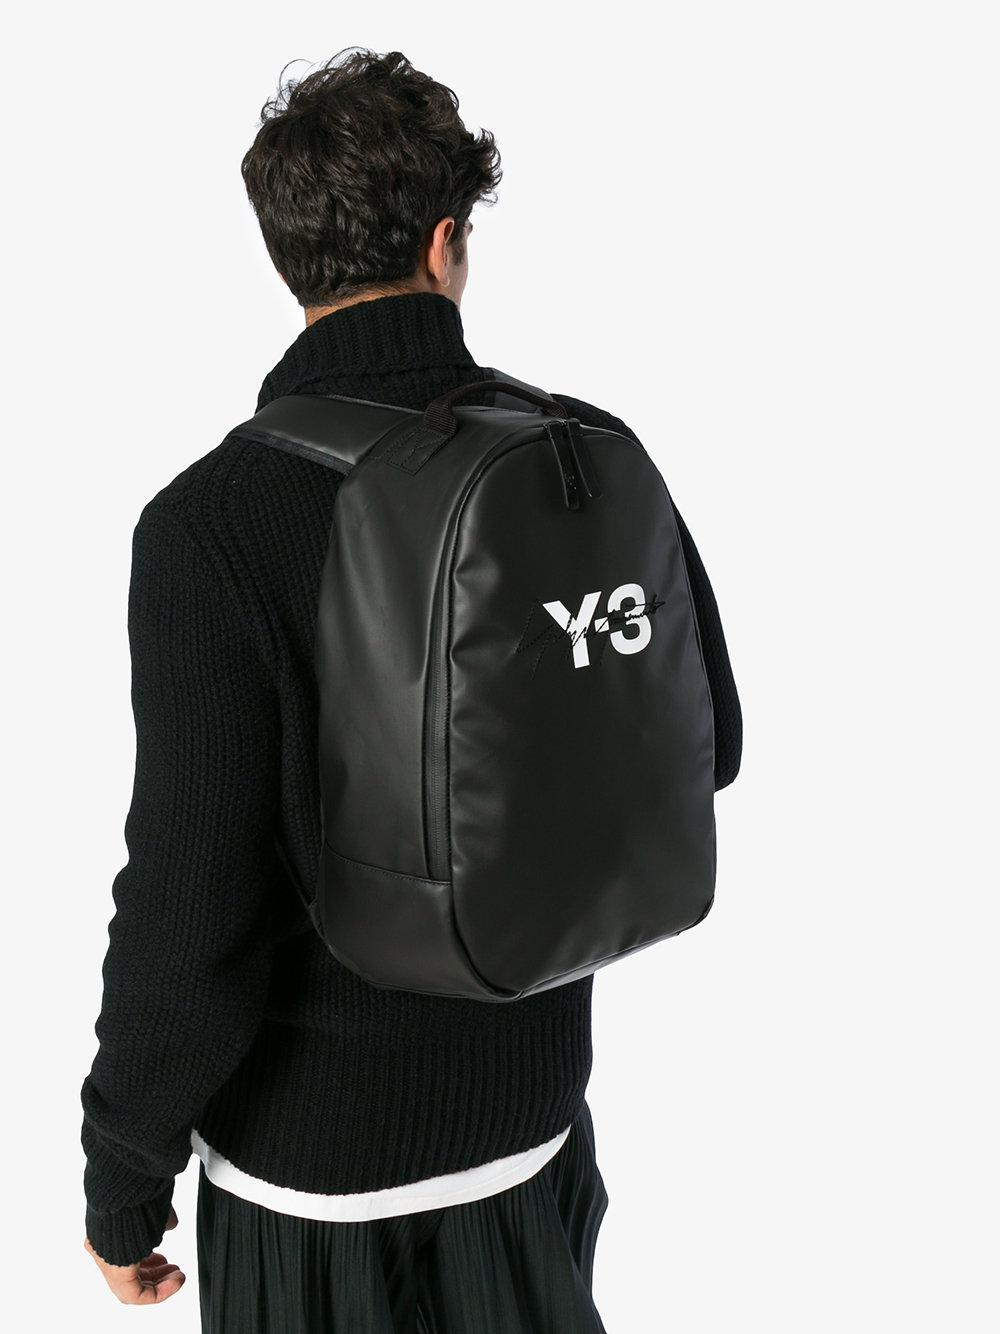 Lyst - Y-3 Black Logo Bag in Black for Men - Save 60% c8f7a27d7aeb4